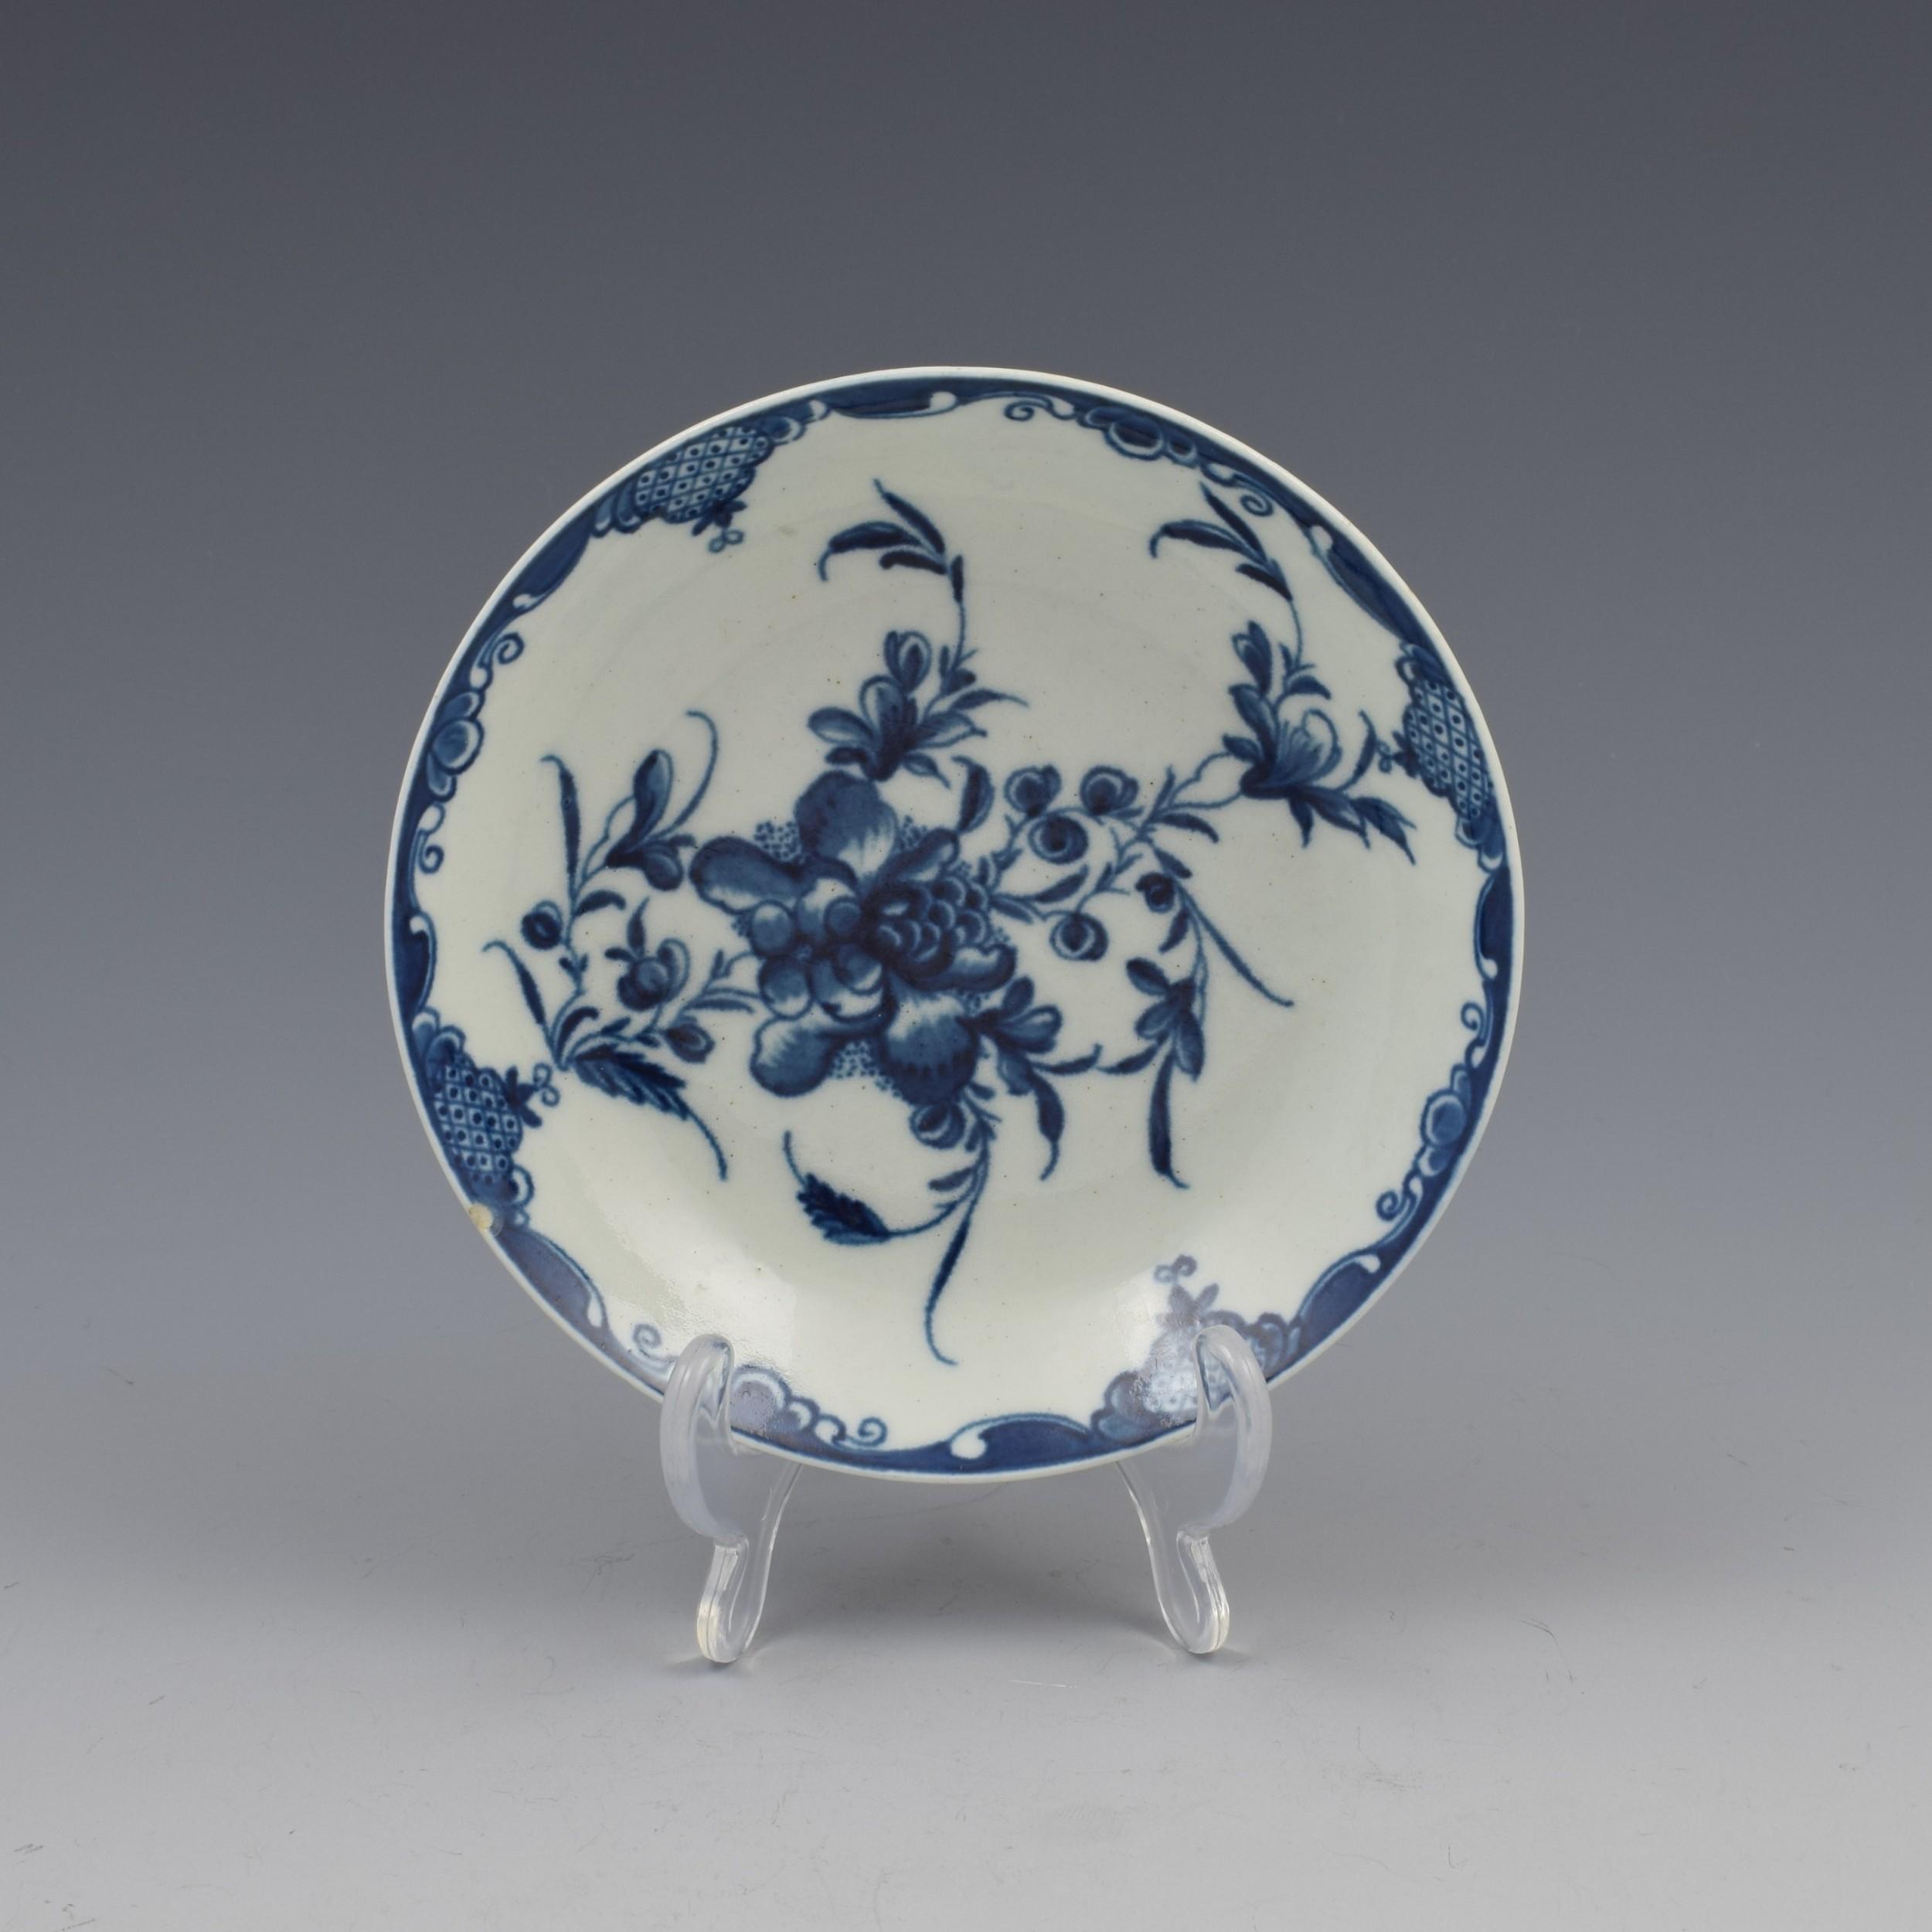 first period worcester porcelain mansfield pattern saucer c1770